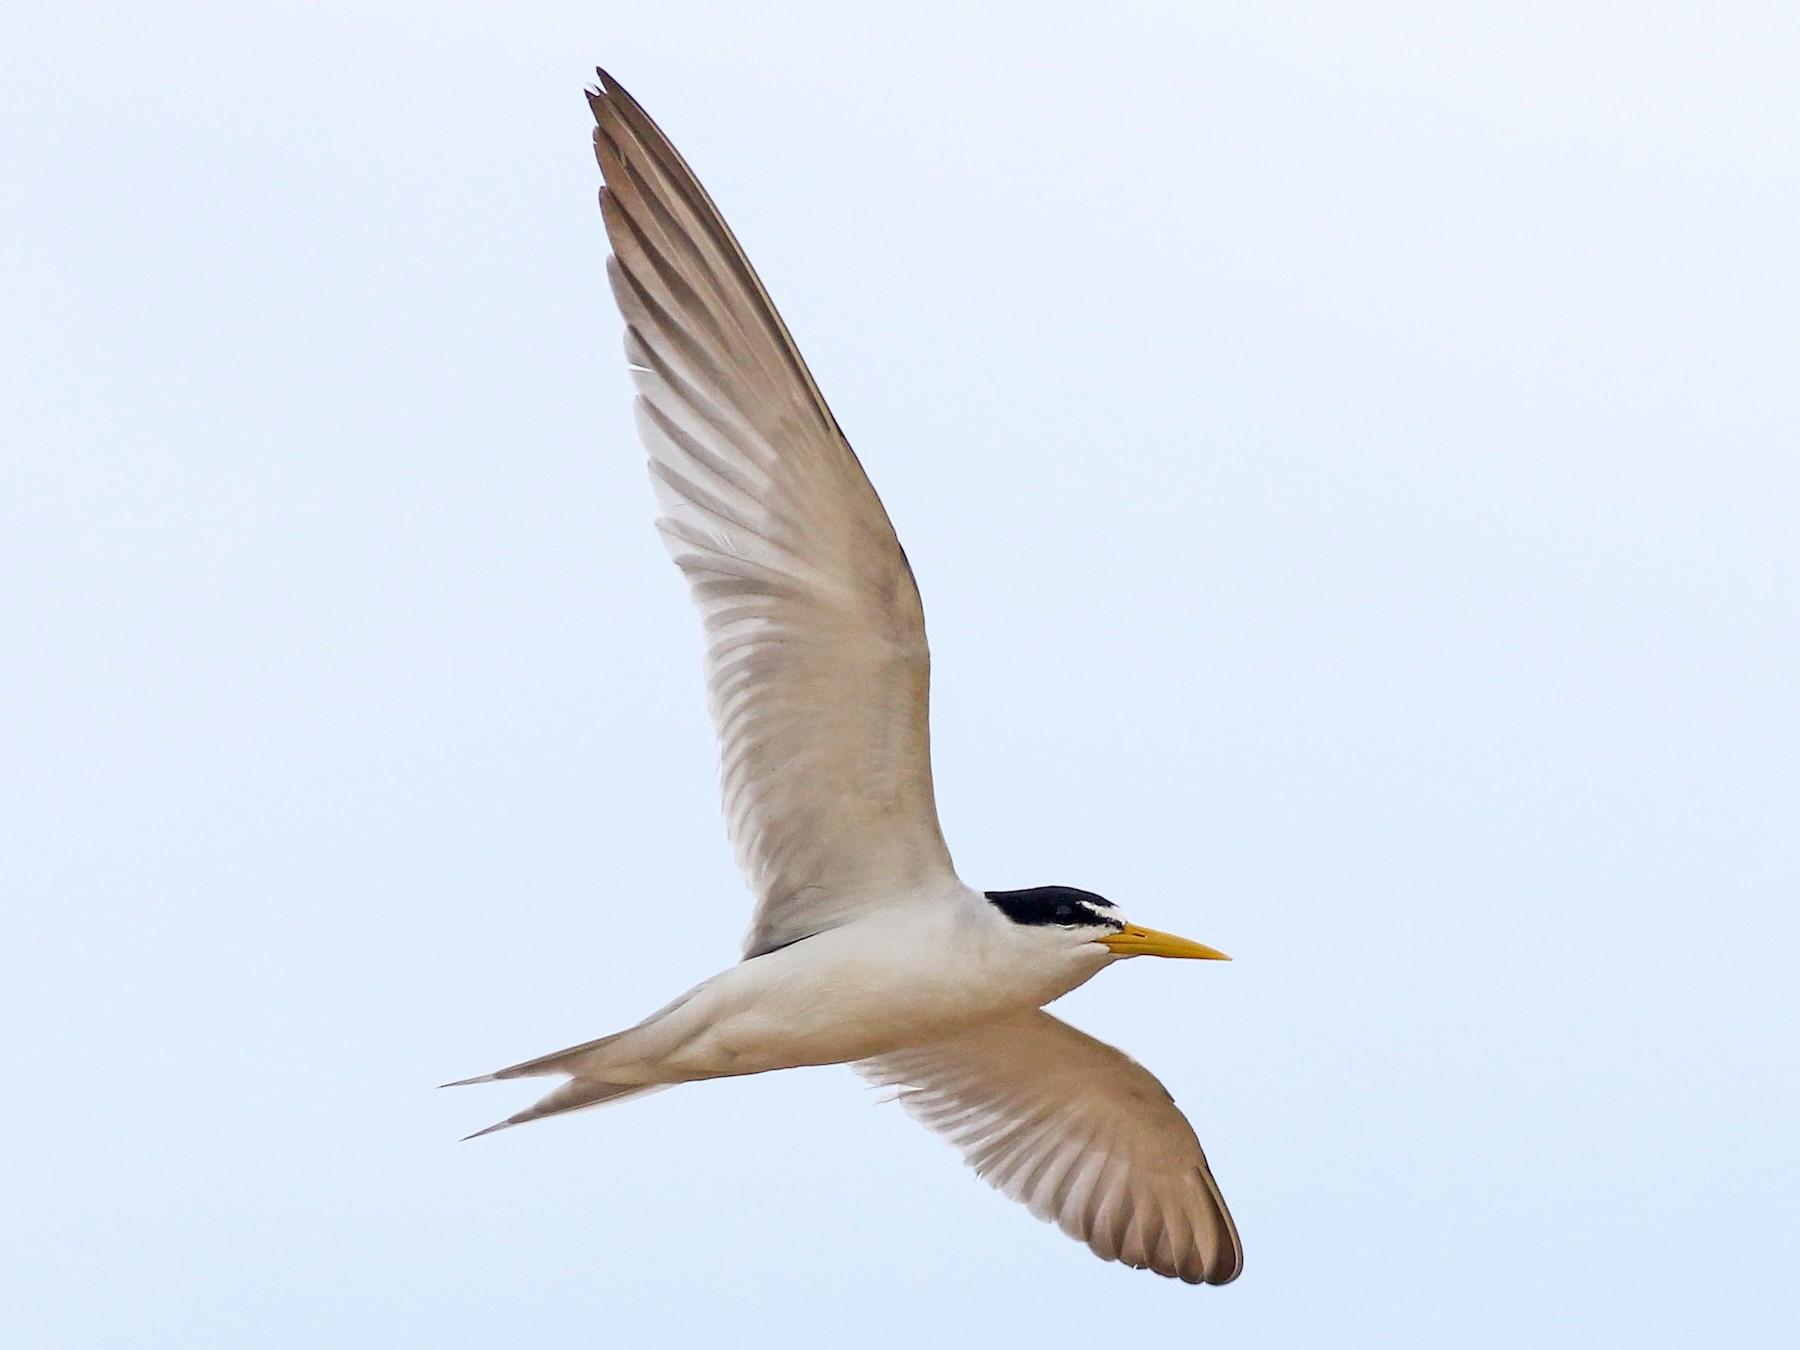 Yellow-billed Tern - Nick Bonomo